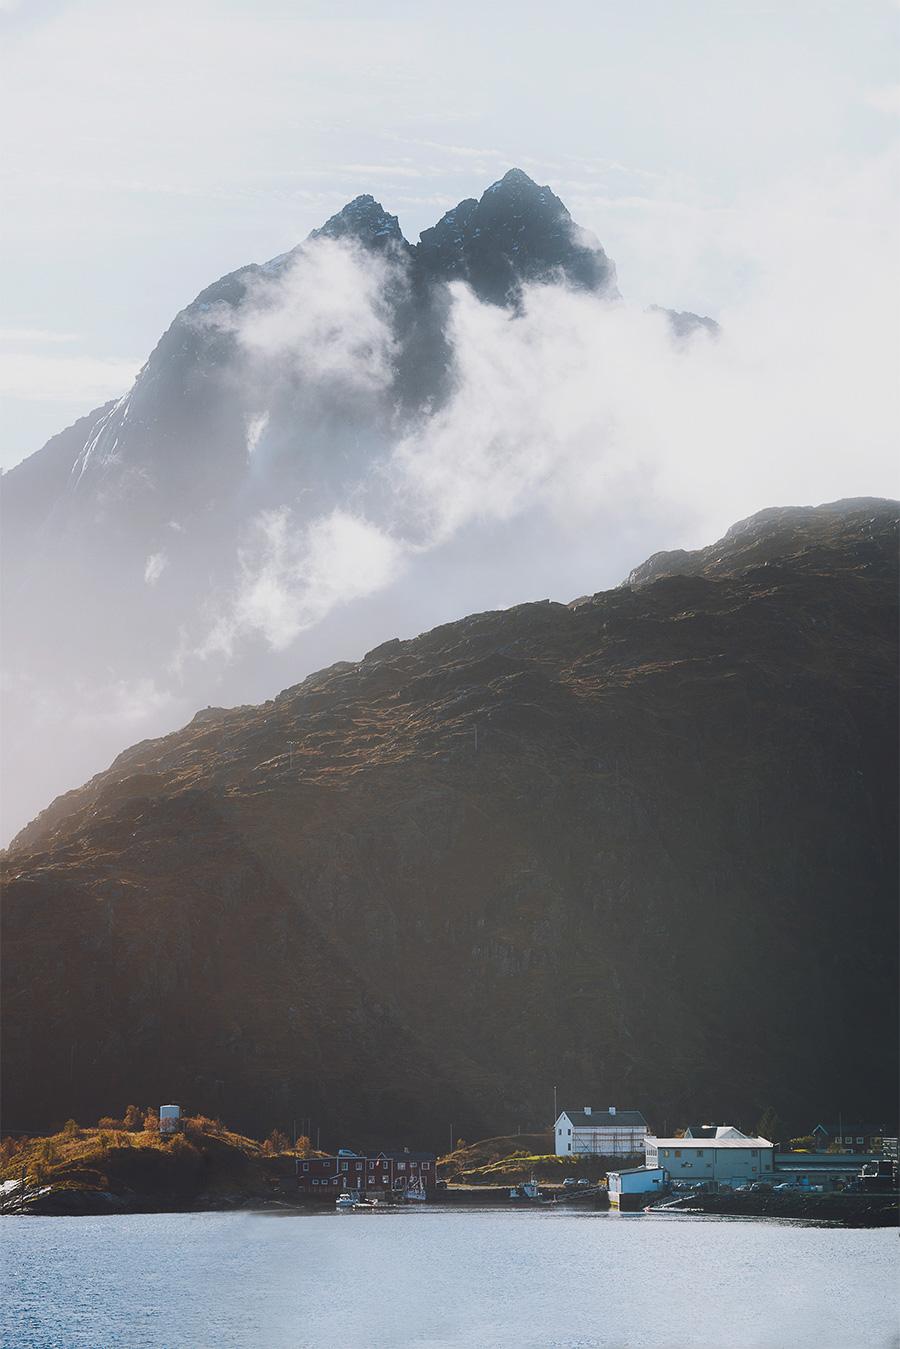 Foggy mountains in Lofoten